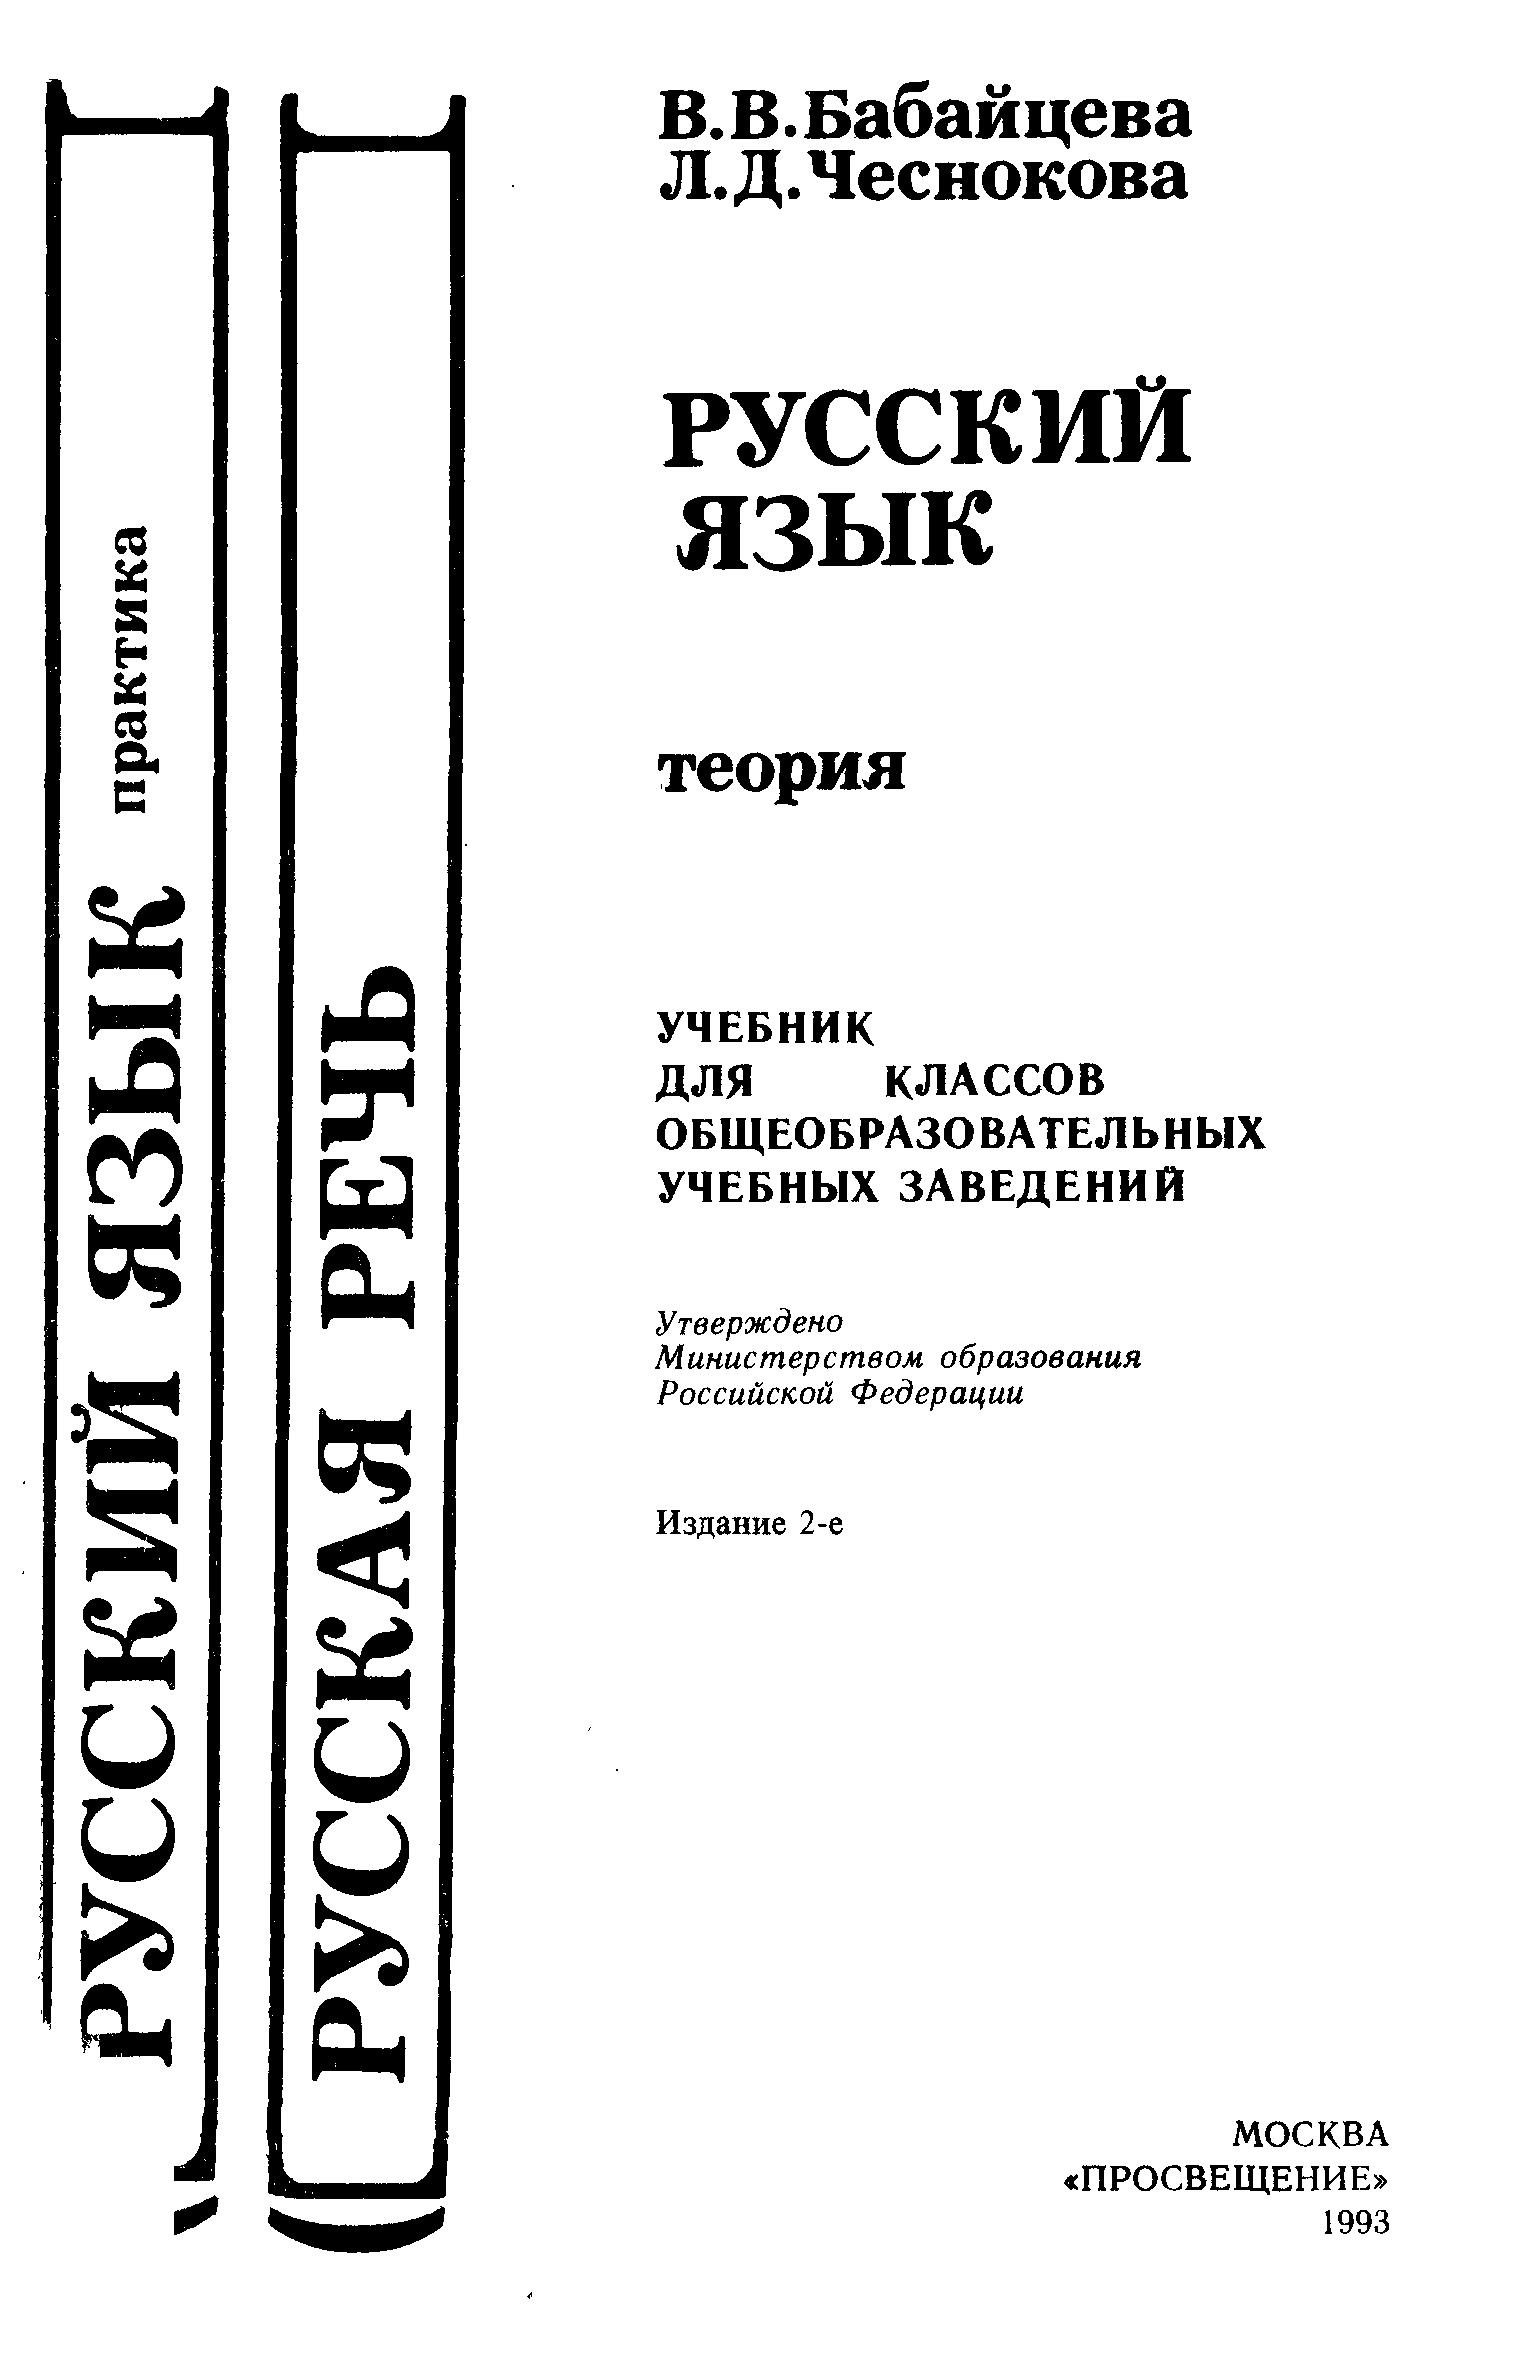 решебник 5 класса по русскому языку бабайцева и чеснокова